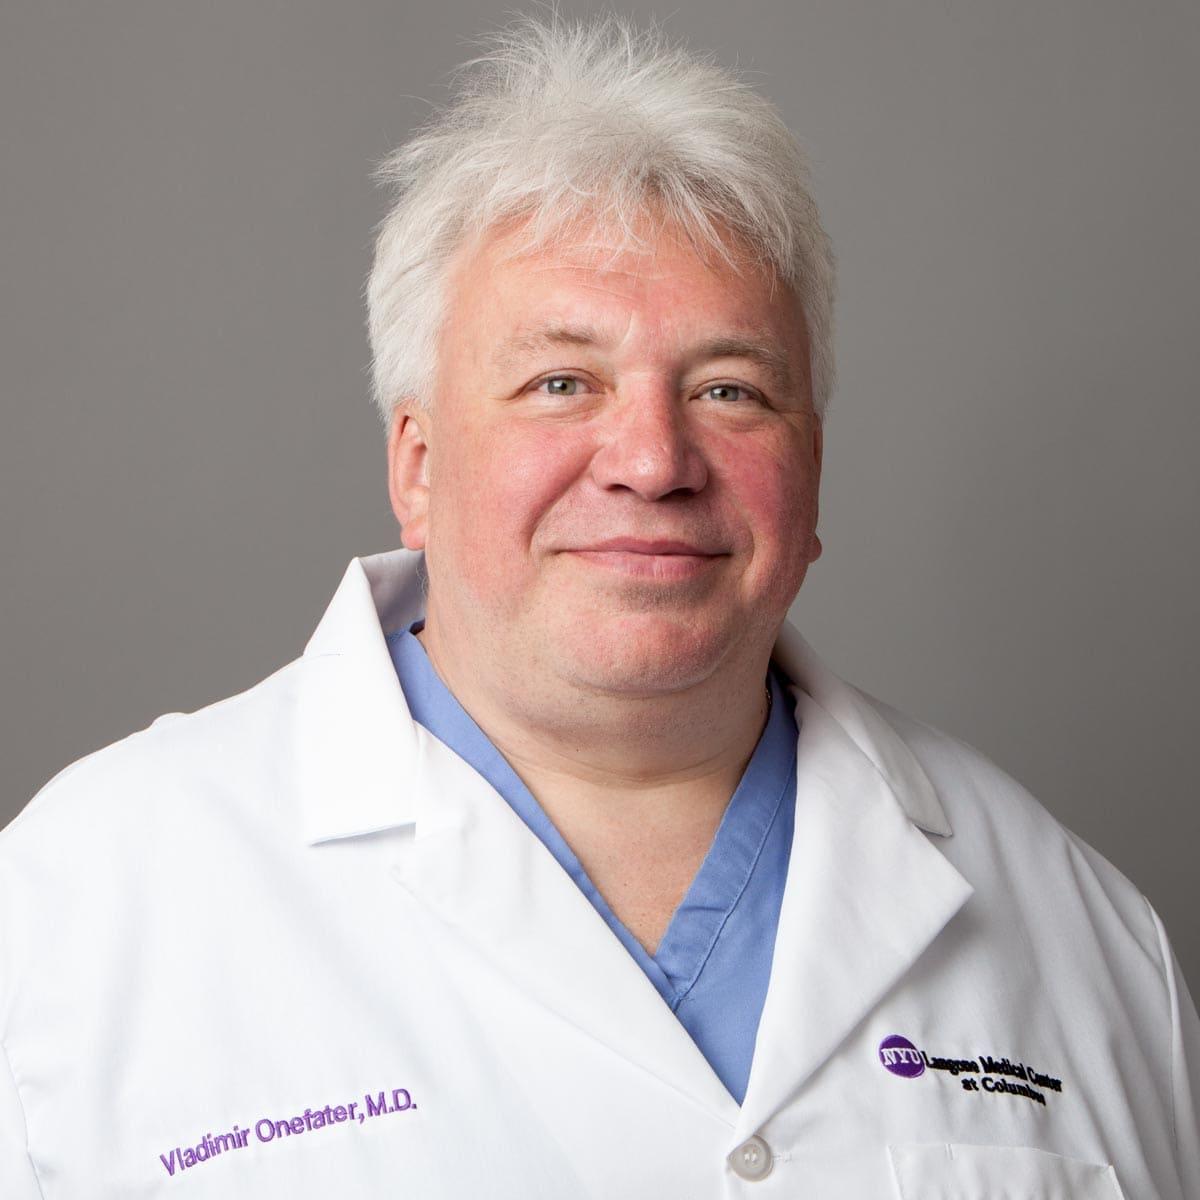 Vladimir S Onefater, MD Physical Medicine & Rehabilitation